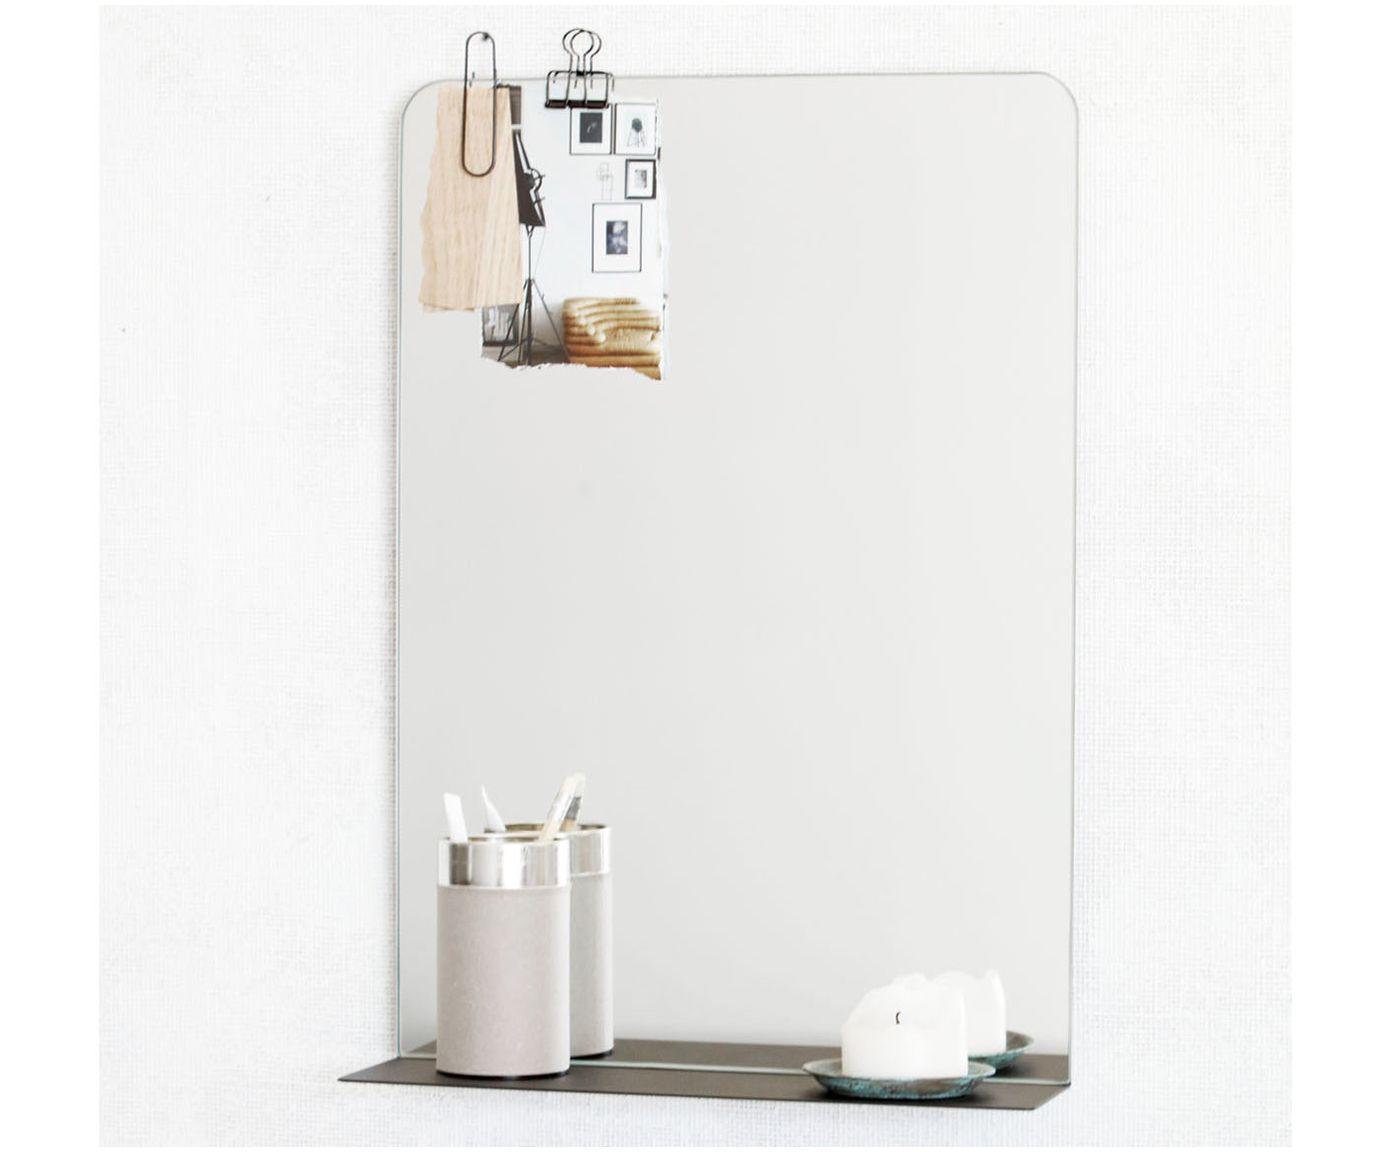 House Doctor Spiegel : Wandspiegel room house doctor wandspiegel und toiletten